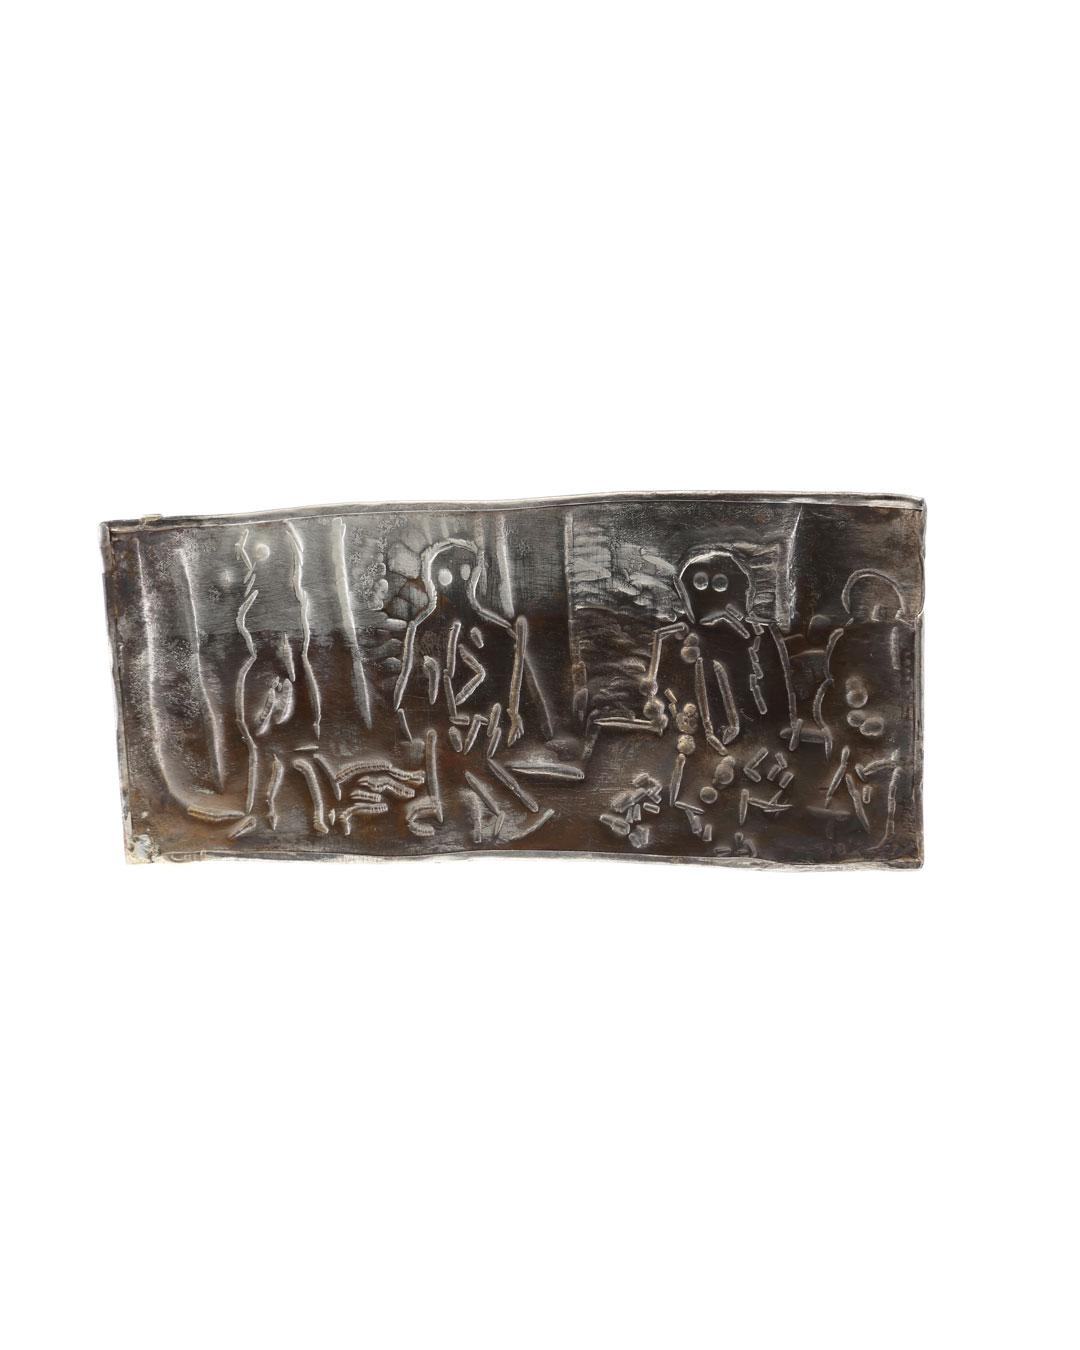 Rudolf Kocéa, Trump wird gebracht (Trump is Brought), 2017, brooch; silver, copper, 115 x 76 x 3 mm, €2950